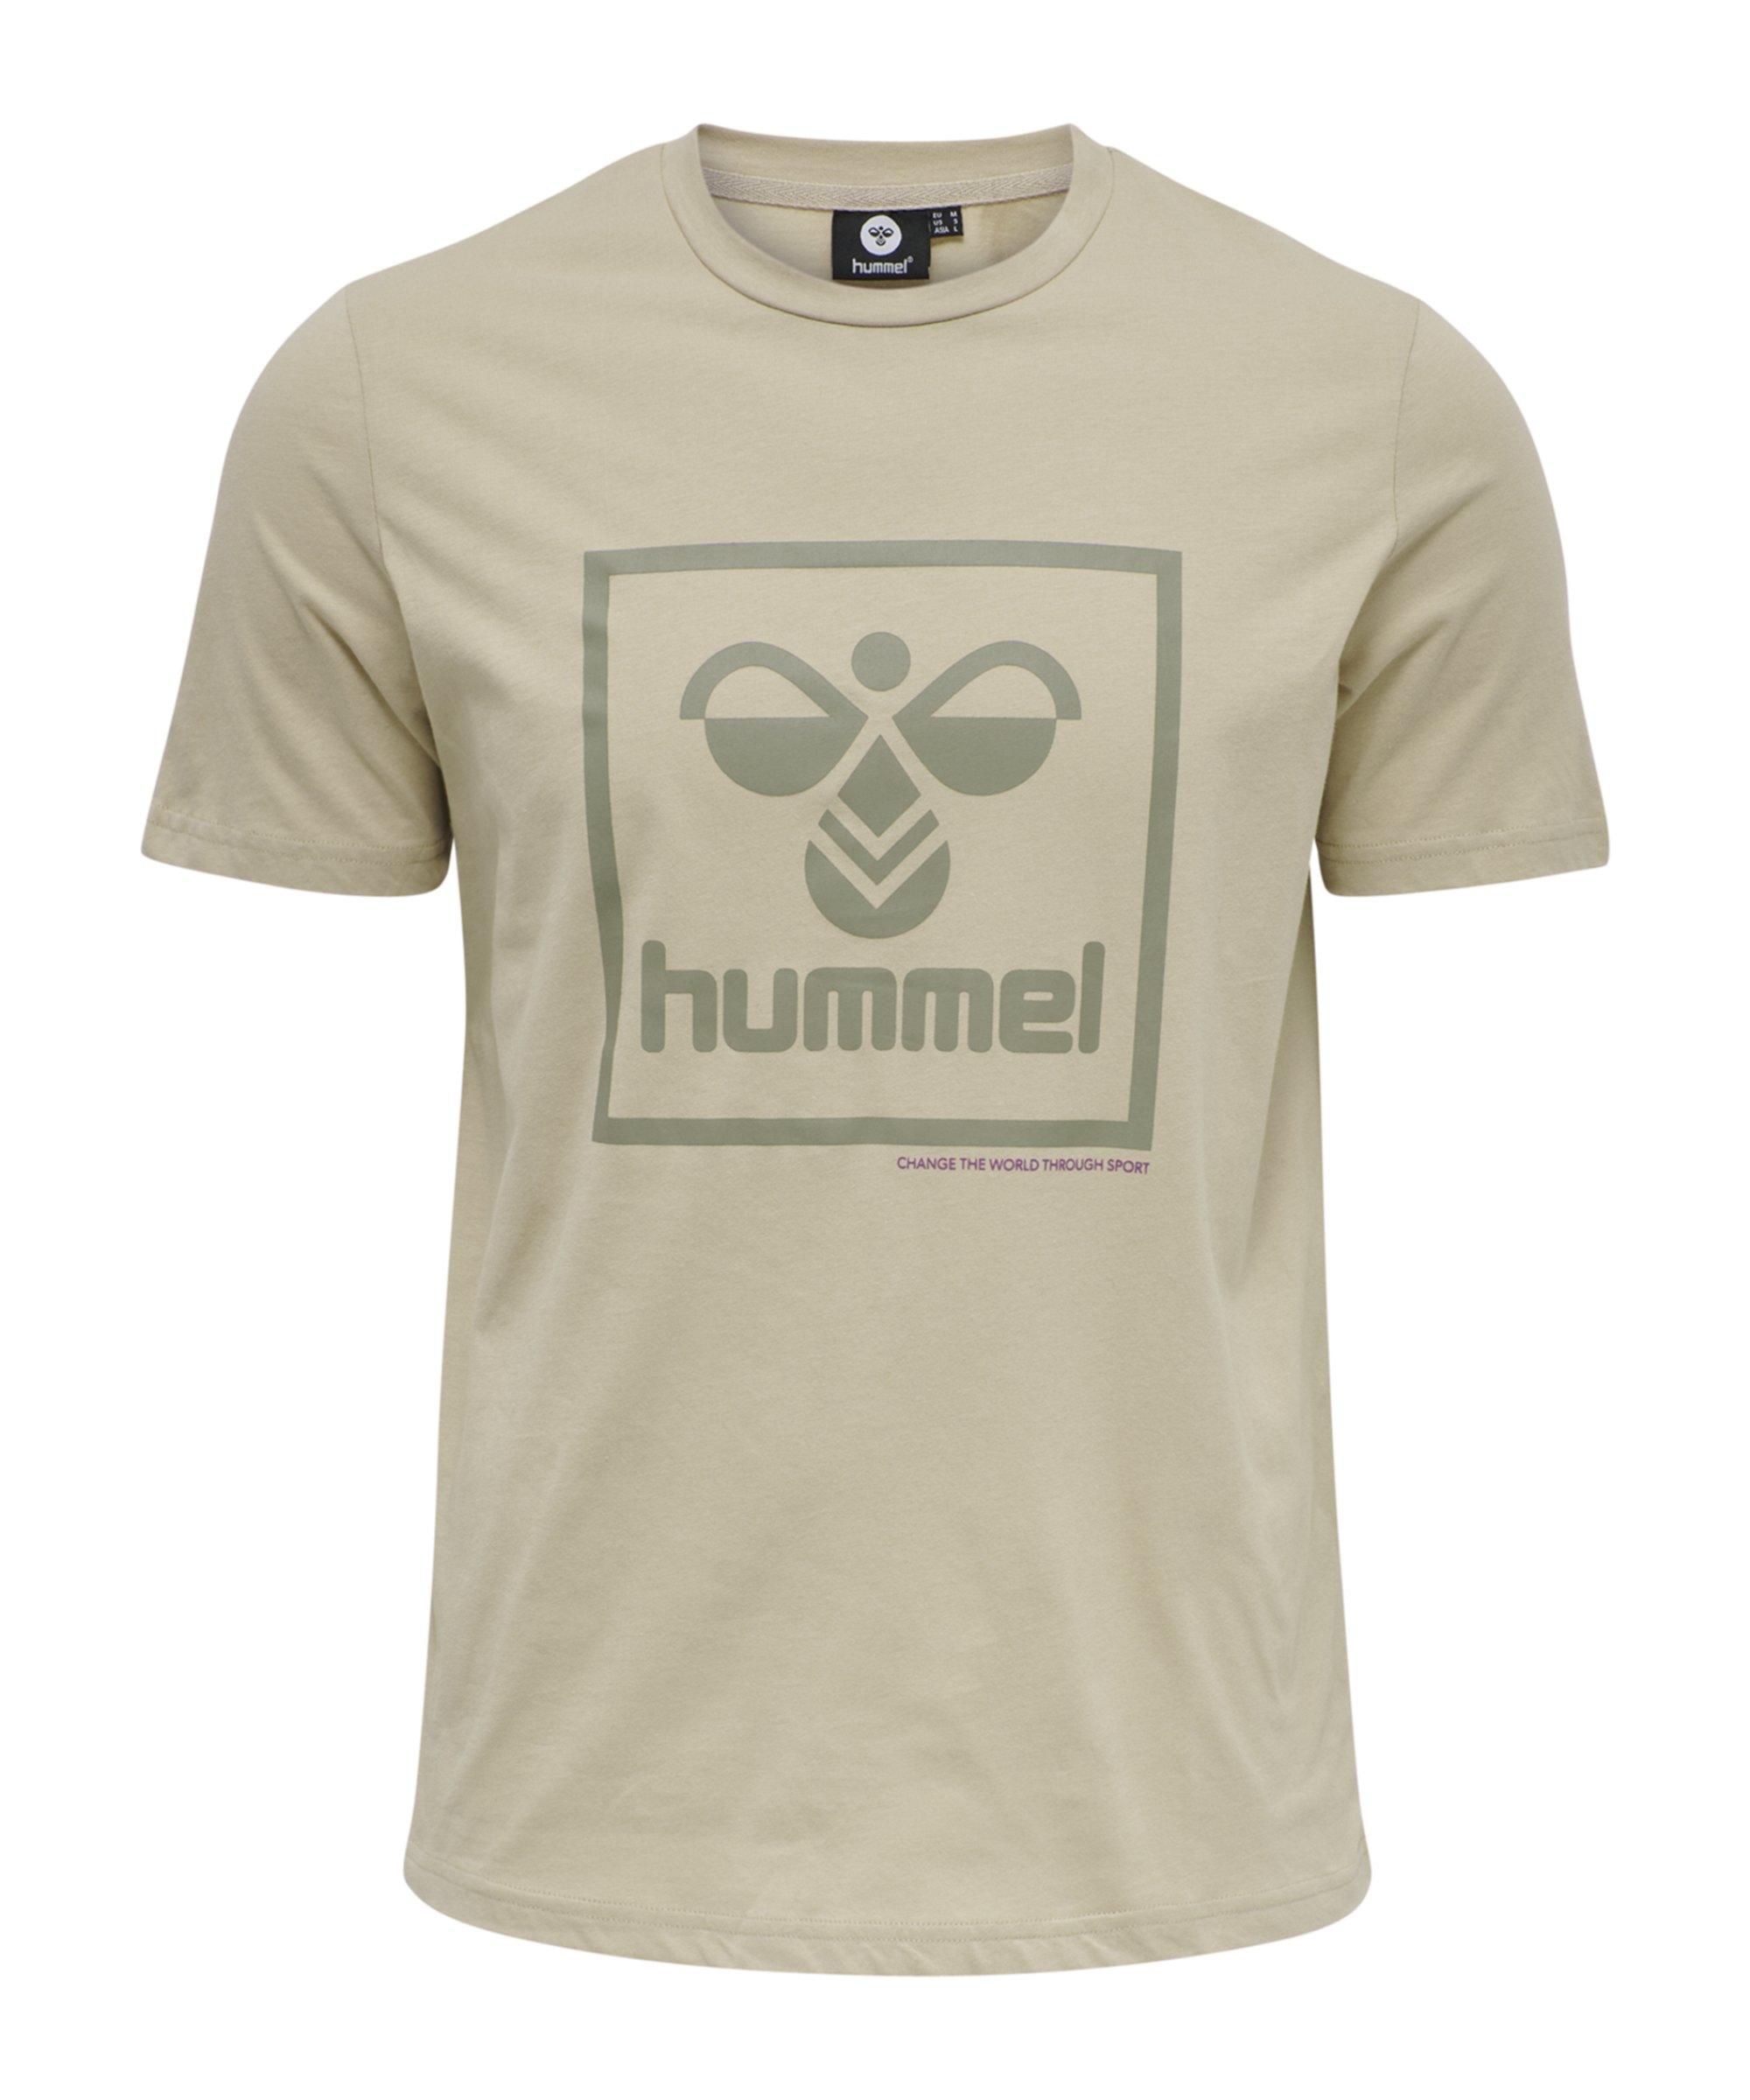 Hummel Isam T-Shirt Braun F2189 - beige